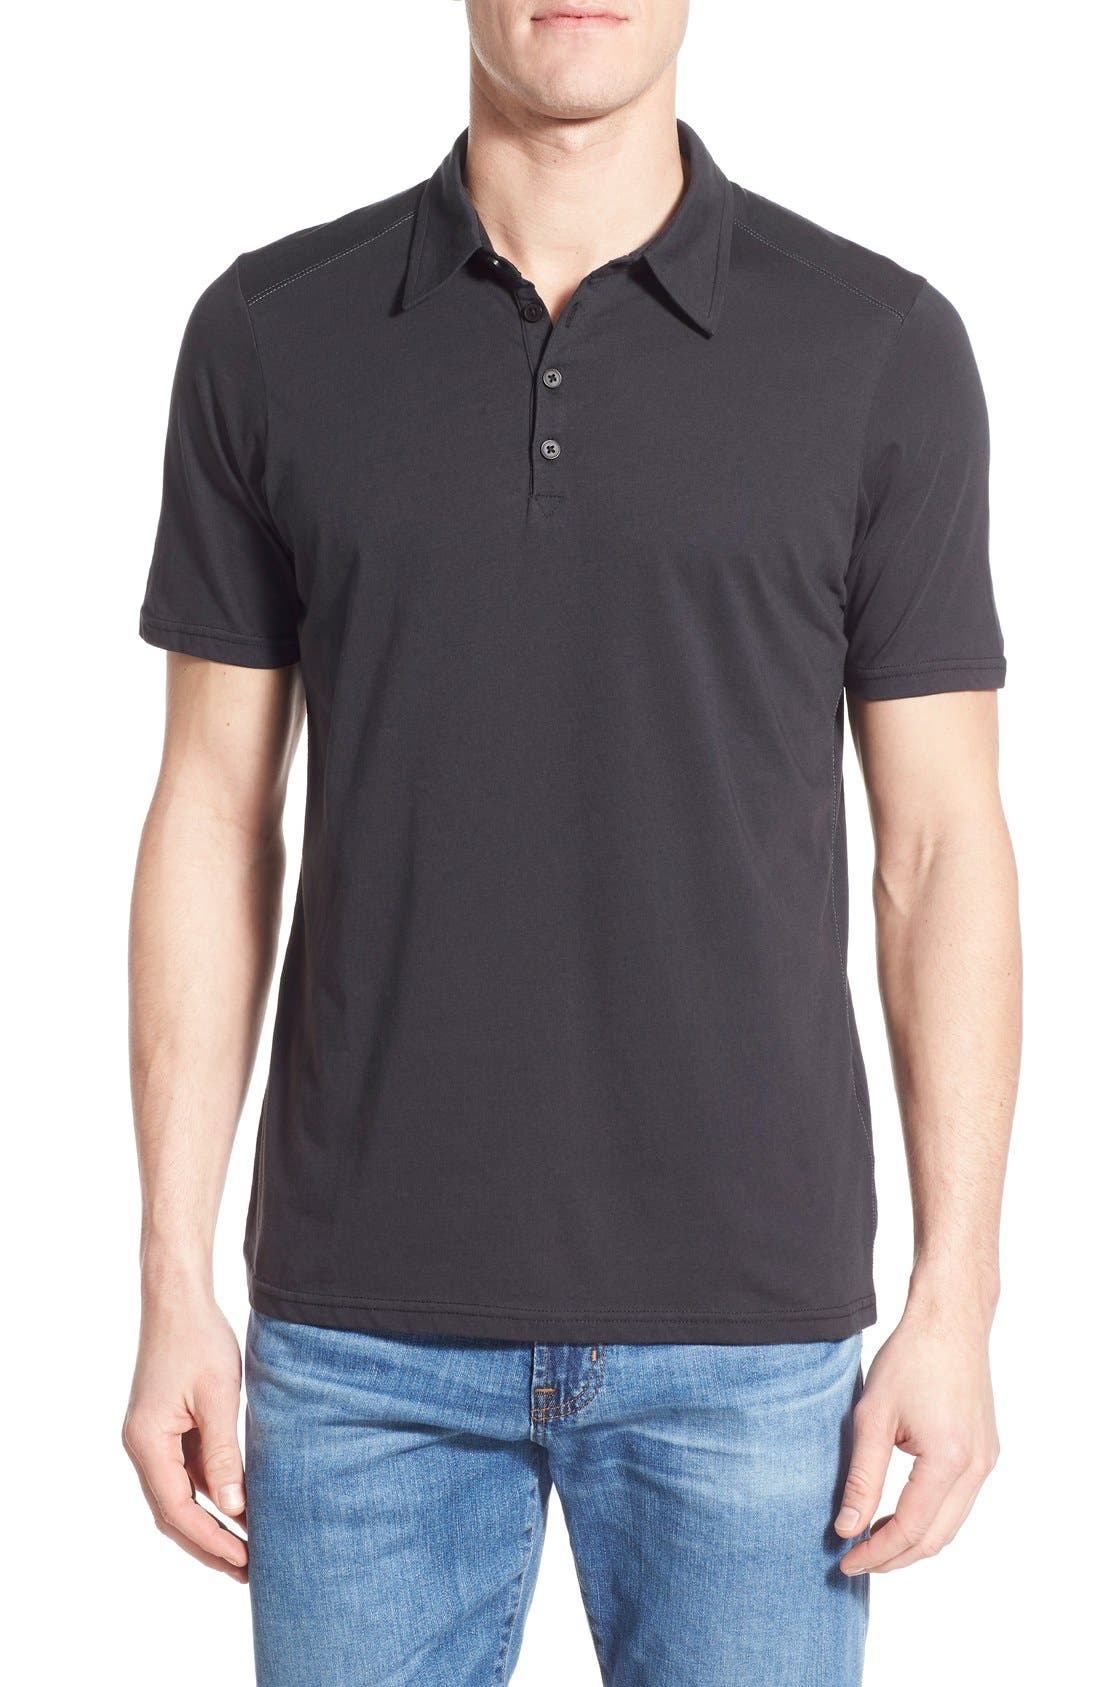 Nau 'Echo' Stripe Jersey Organic Cotton Polo